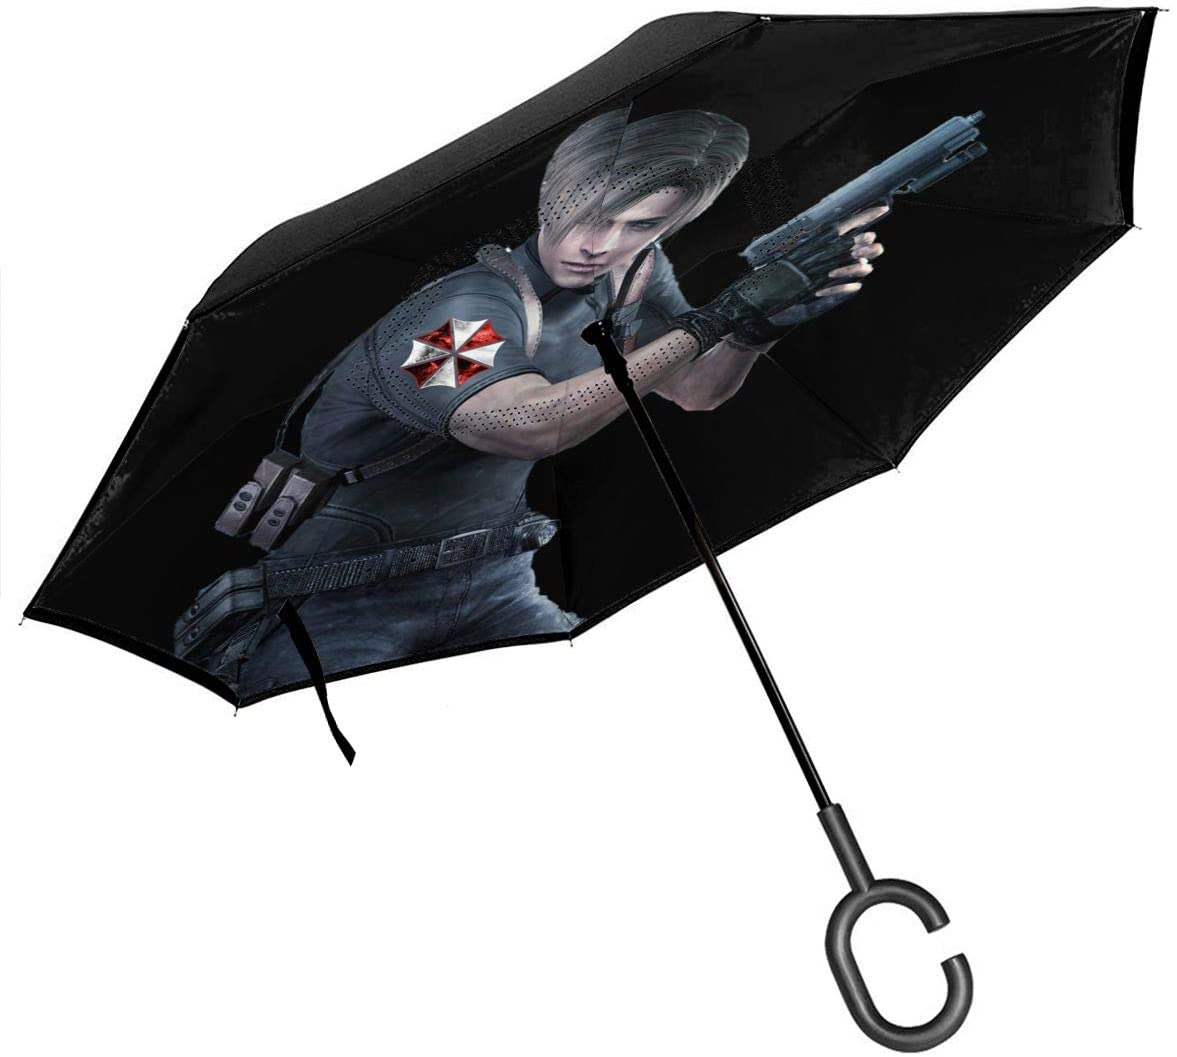 N/C Resident Evil Reverse Umbrella